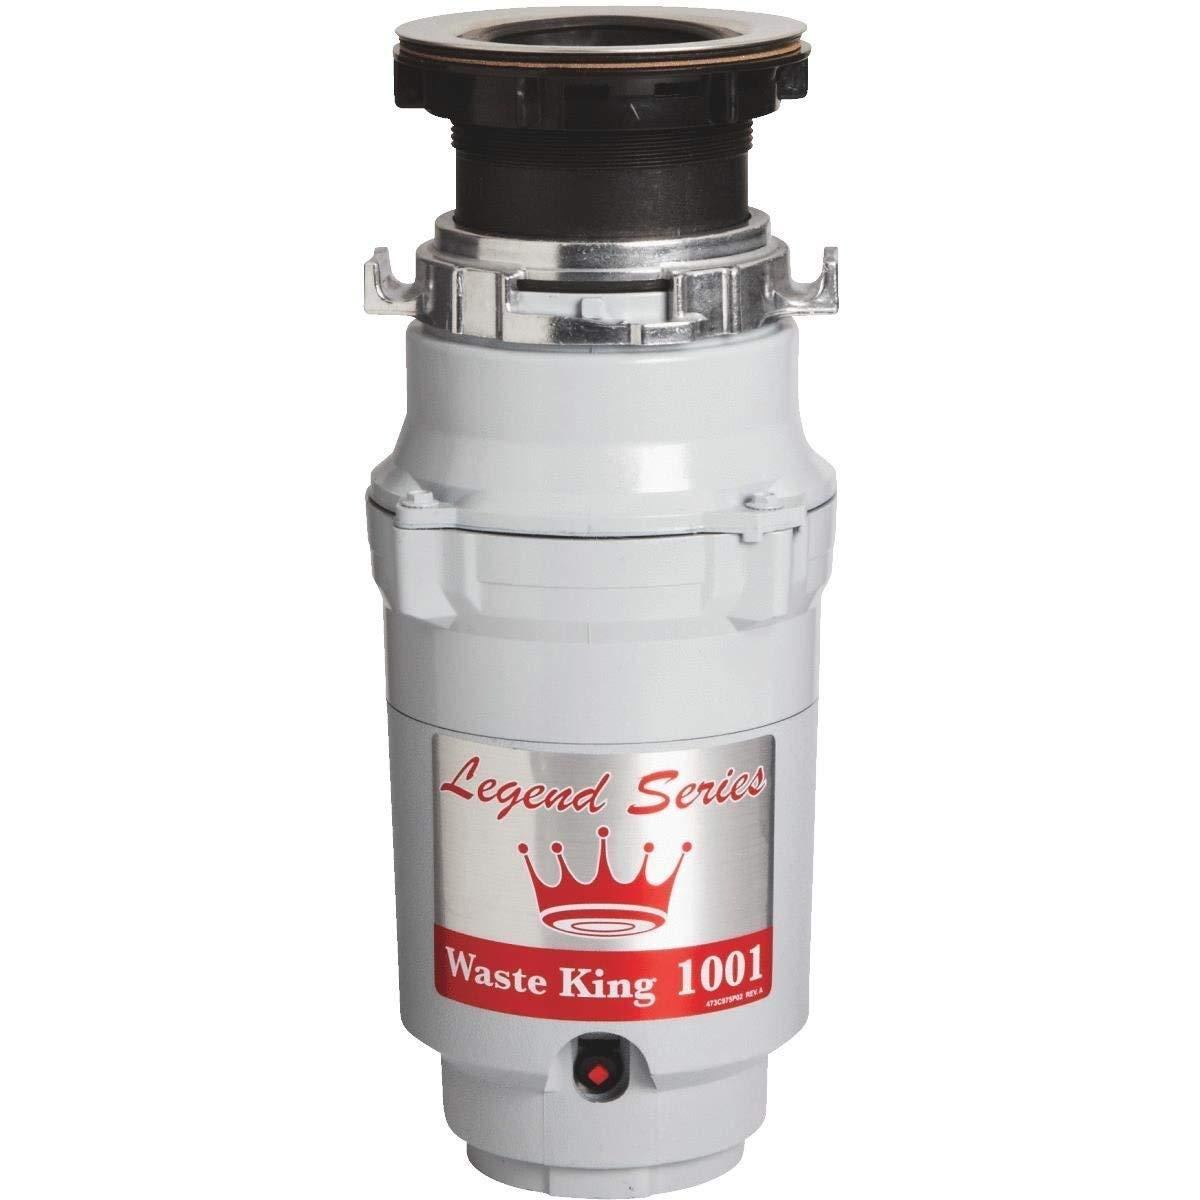 Waste King L-1001 Garbage Disposal with Power Cord, 1/2 HP - (Renewed)